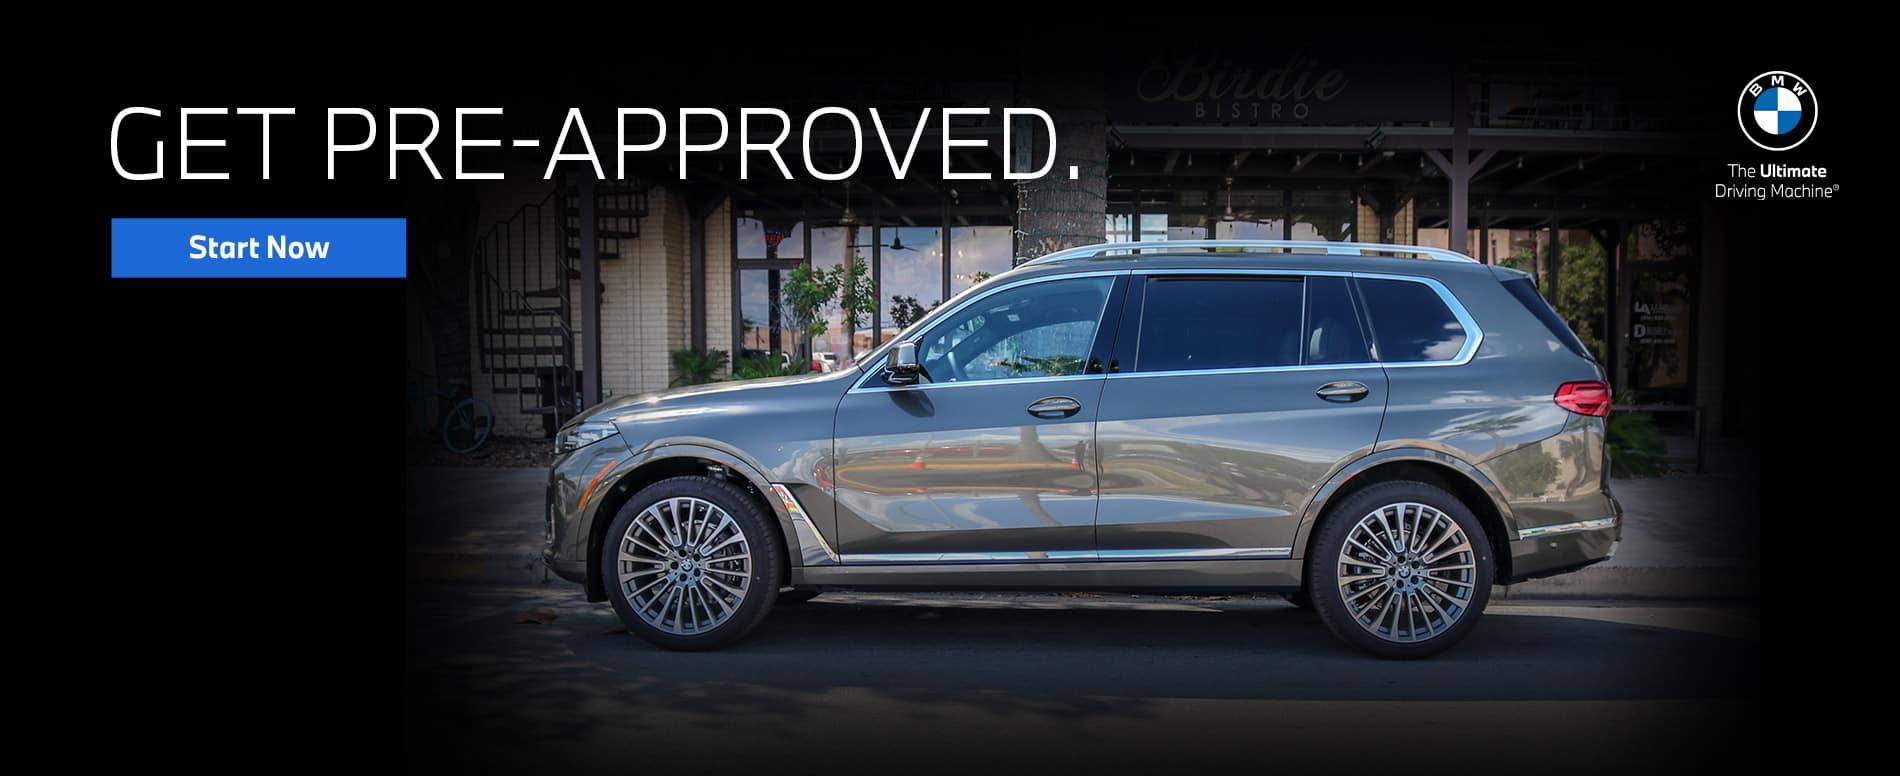 Get Pre-Approved   Bert Ogden BMW in McAllen, Texas